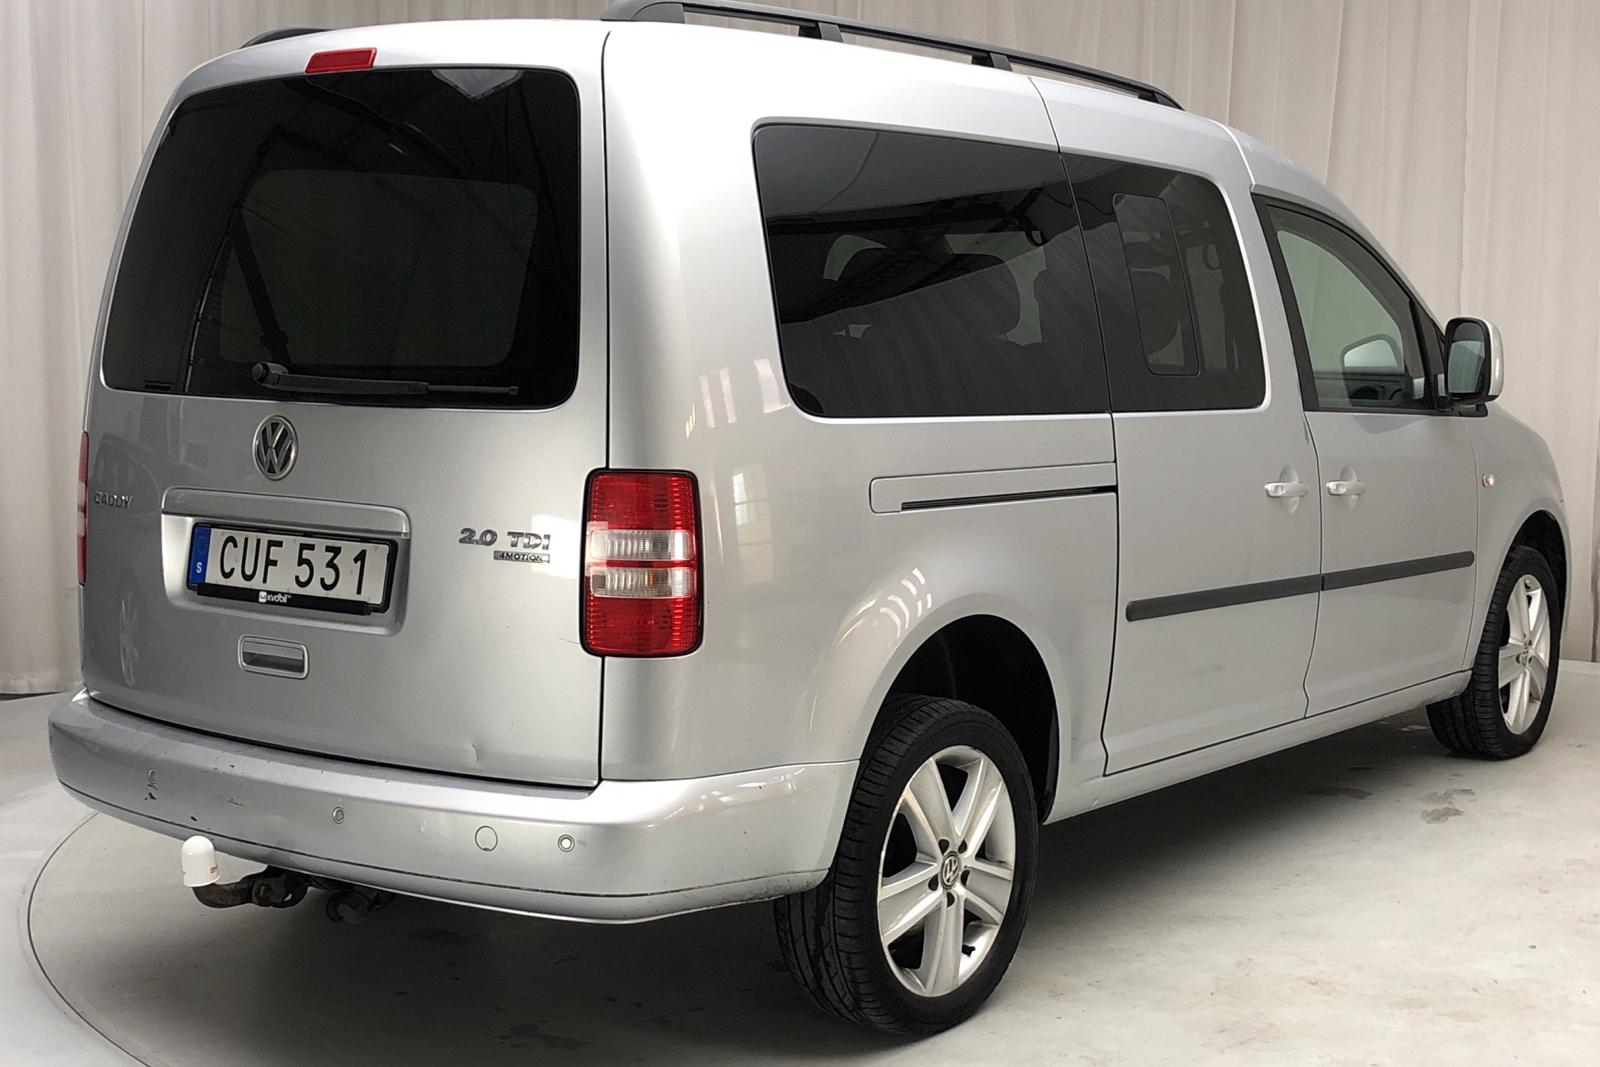 VW Caddy MPV Maxi 2.0 TDI 4Motion (140hk) - 18 500 mil - Automat - silver - 2015